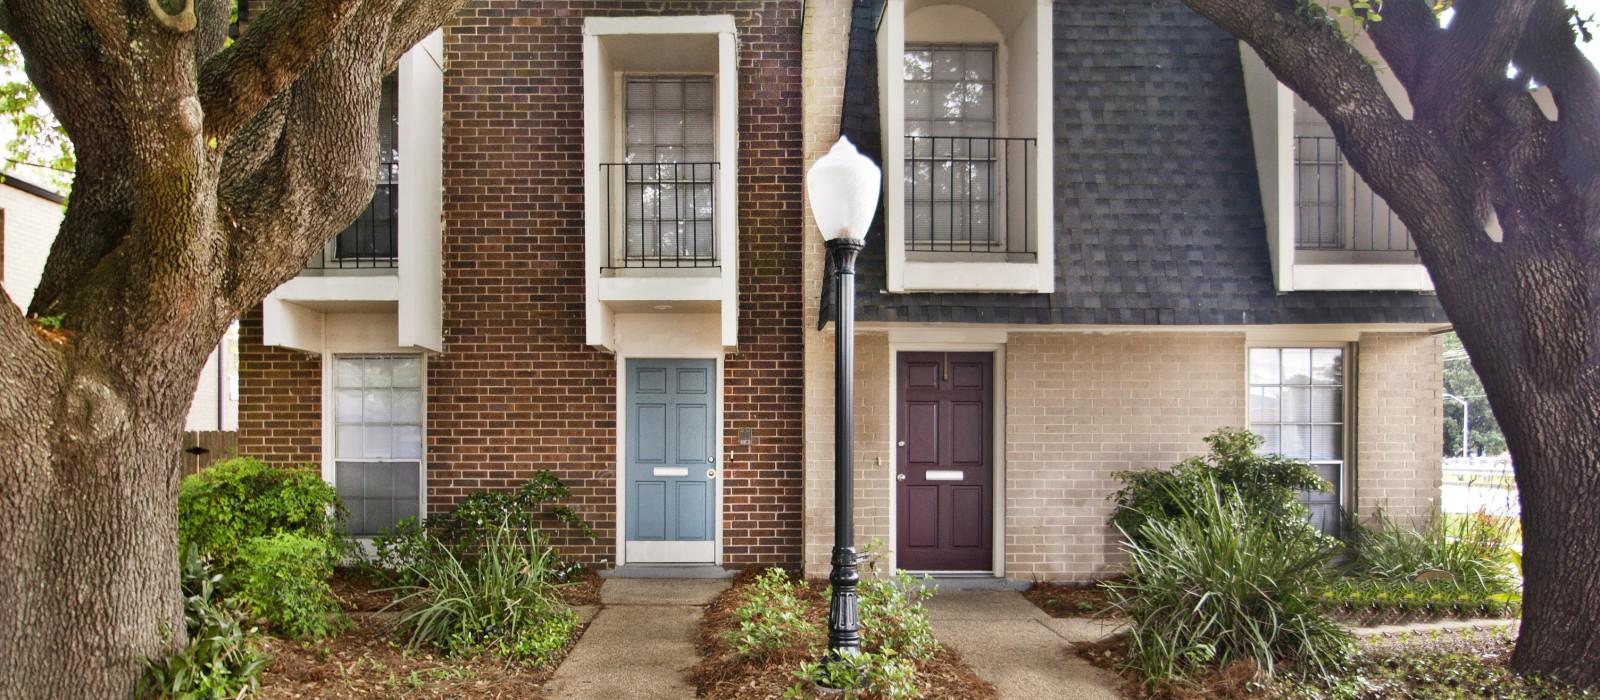 Rosedale Apartments In Metairie La 3 Bedroom Apartments For Rent 1st Lake Properties